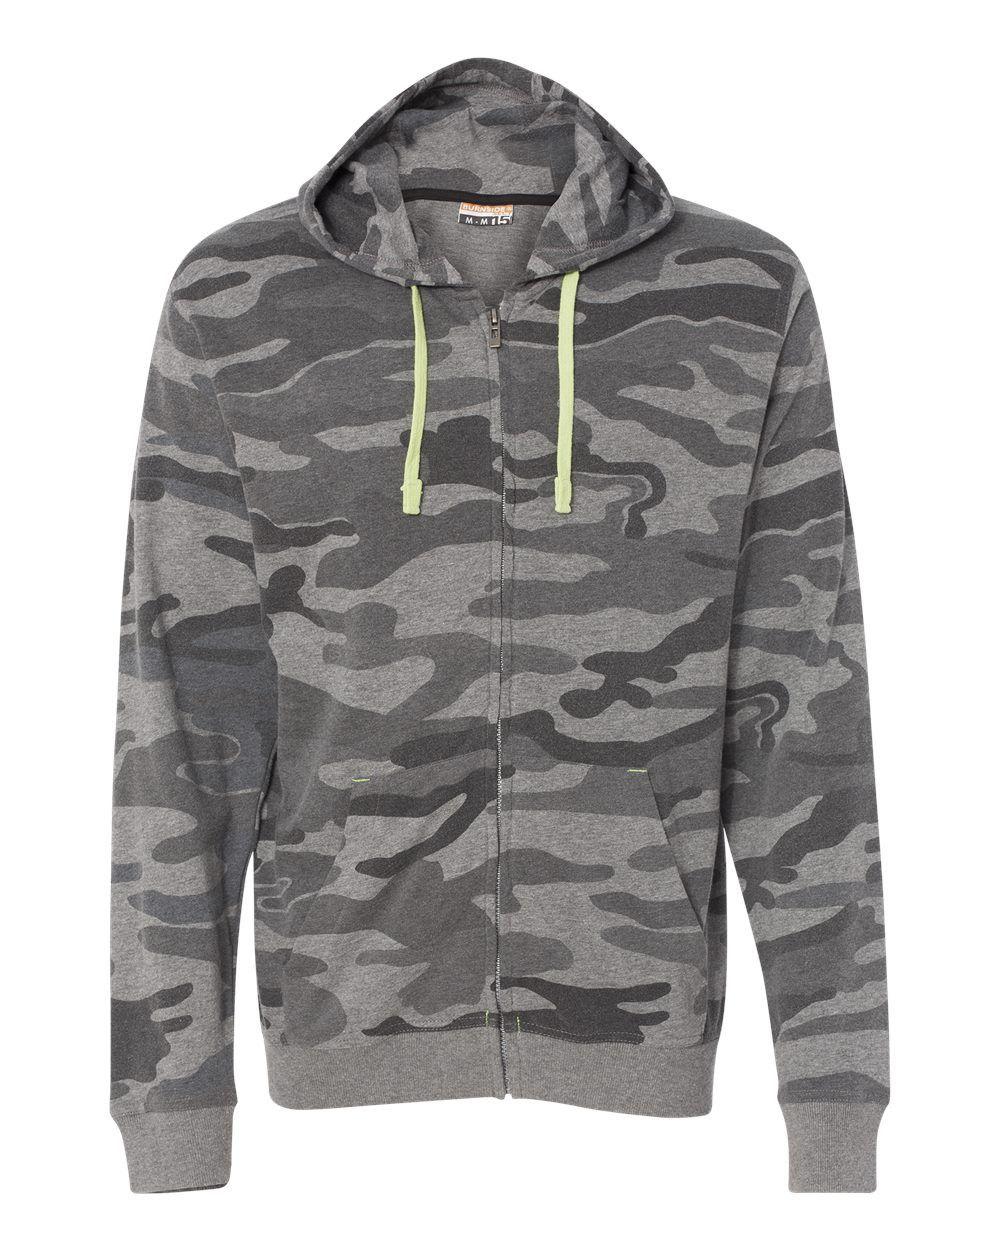 Burnside Camo Full Zip Hooded Sweatshirt B8615 Black